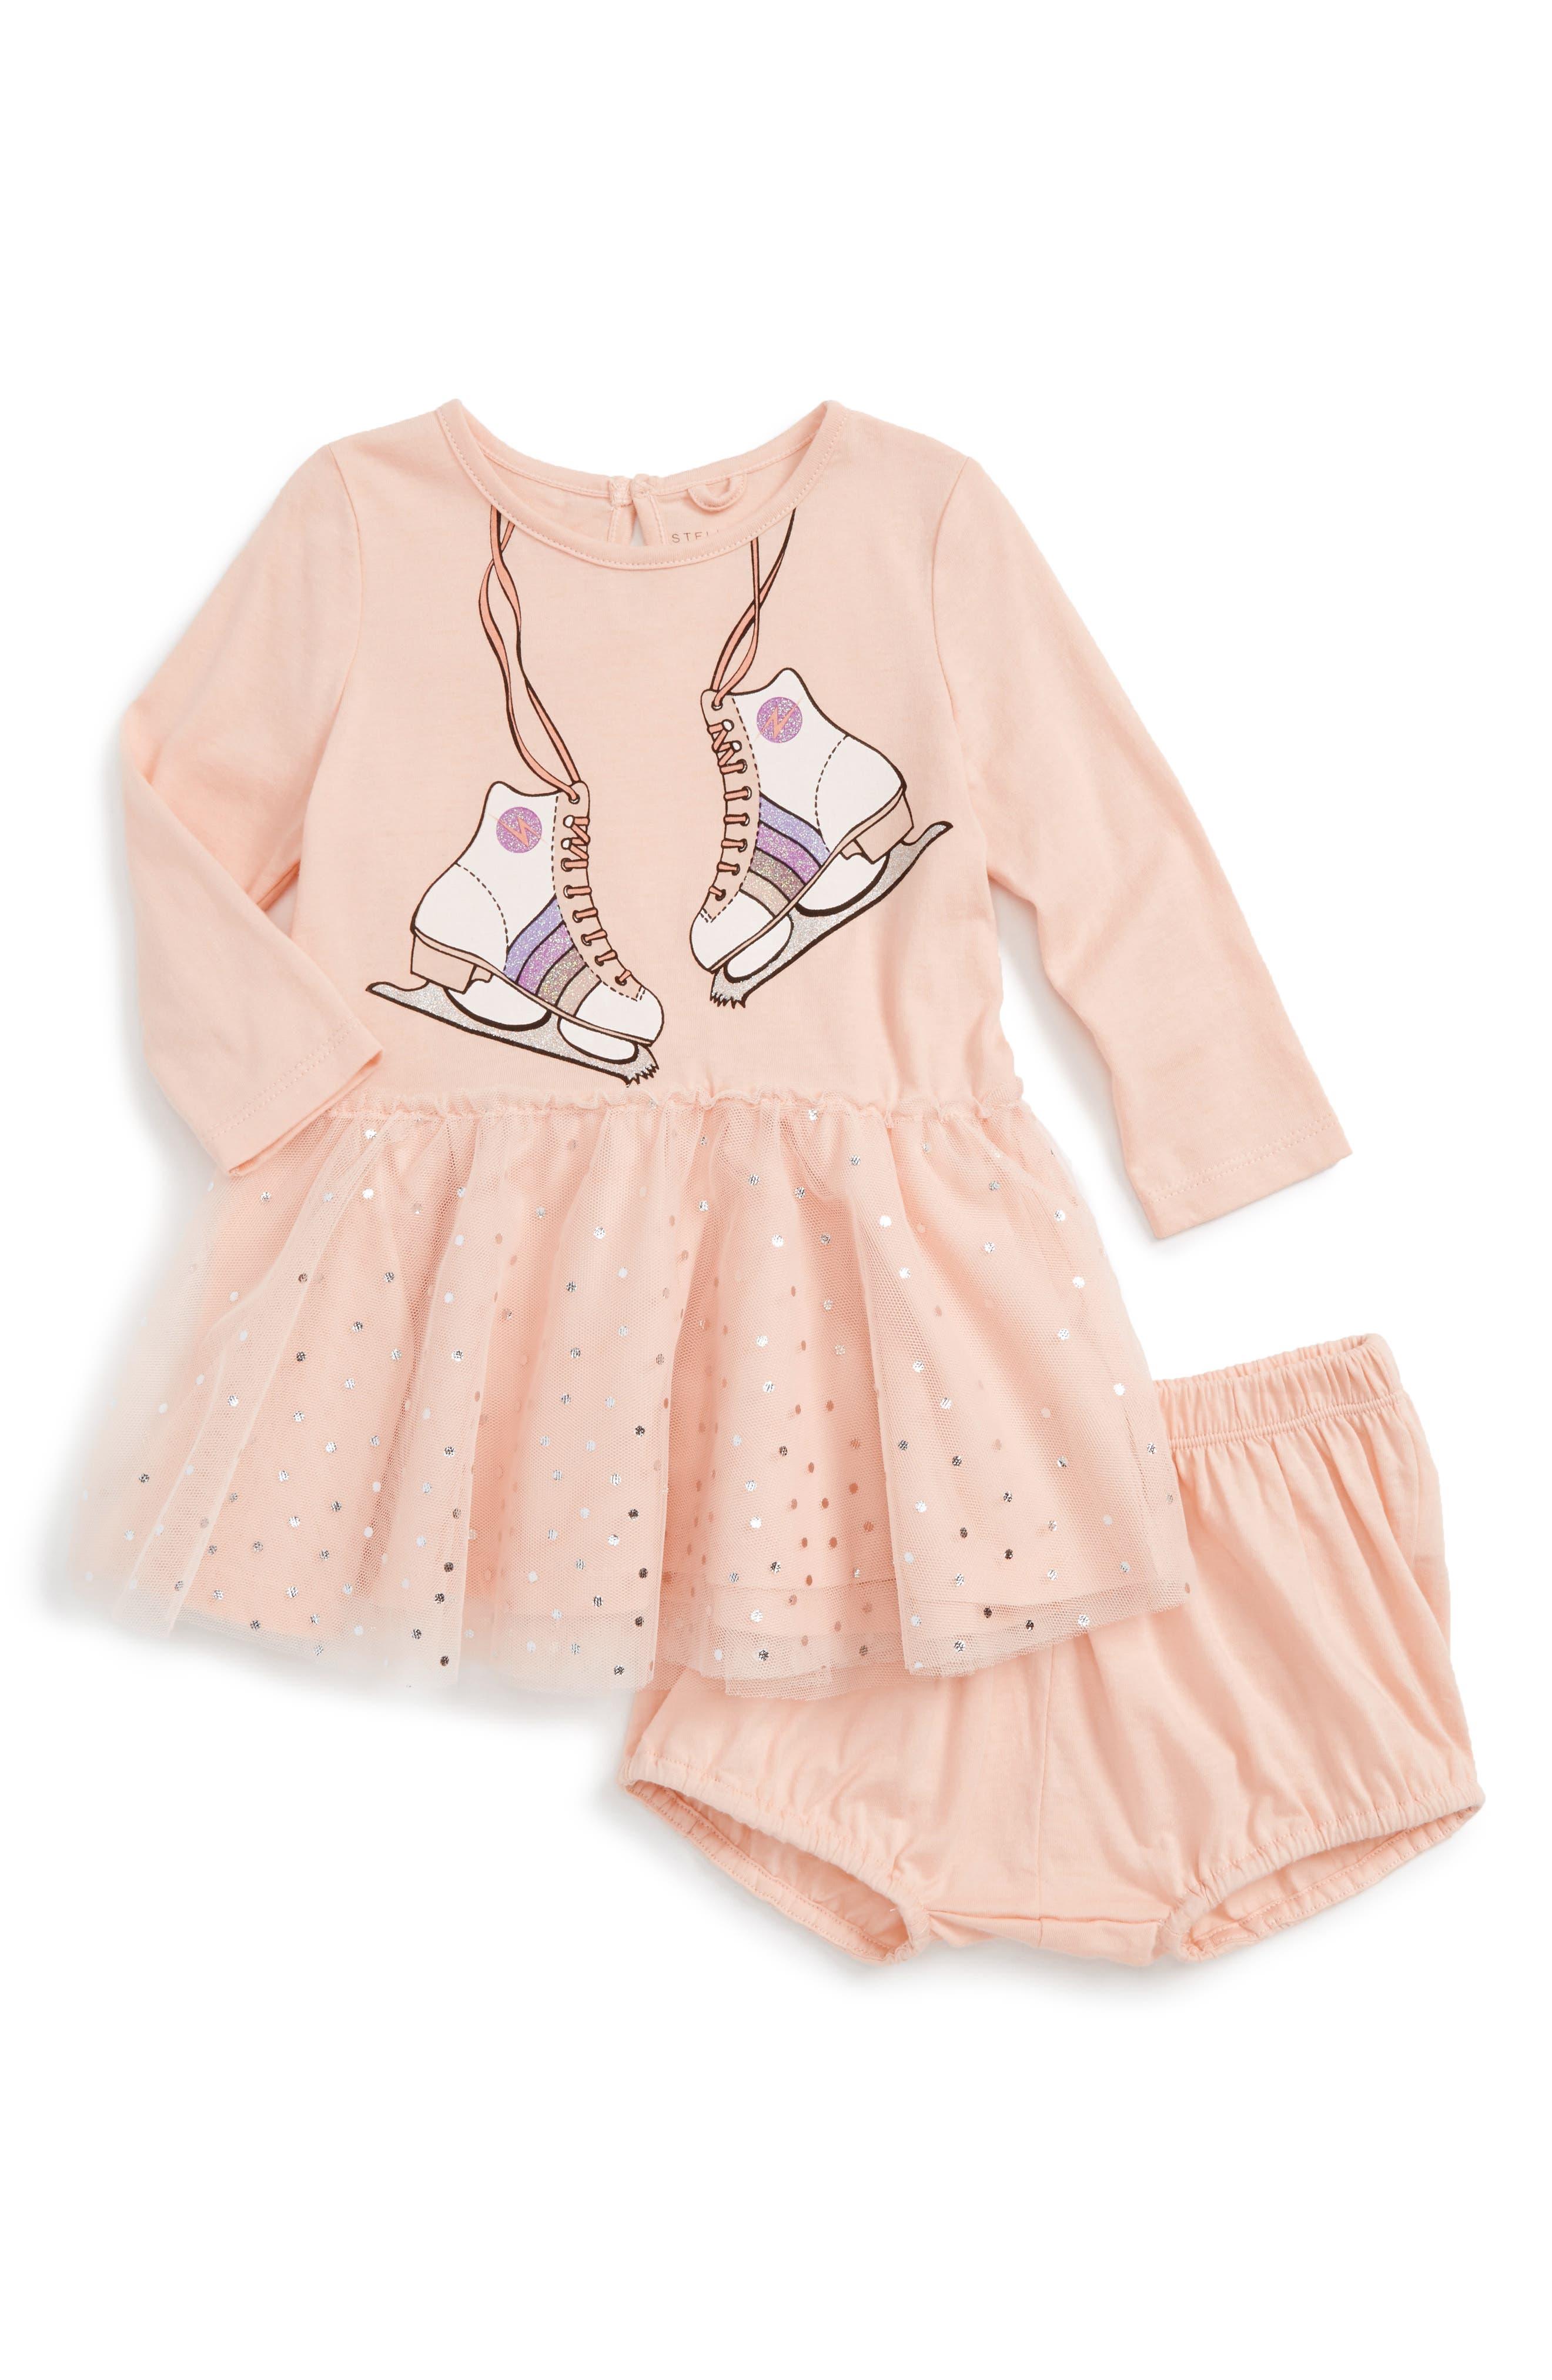 Alternate Image 1 Selected - Stella McCartney Kids Primrose Dress (Baby Girls)